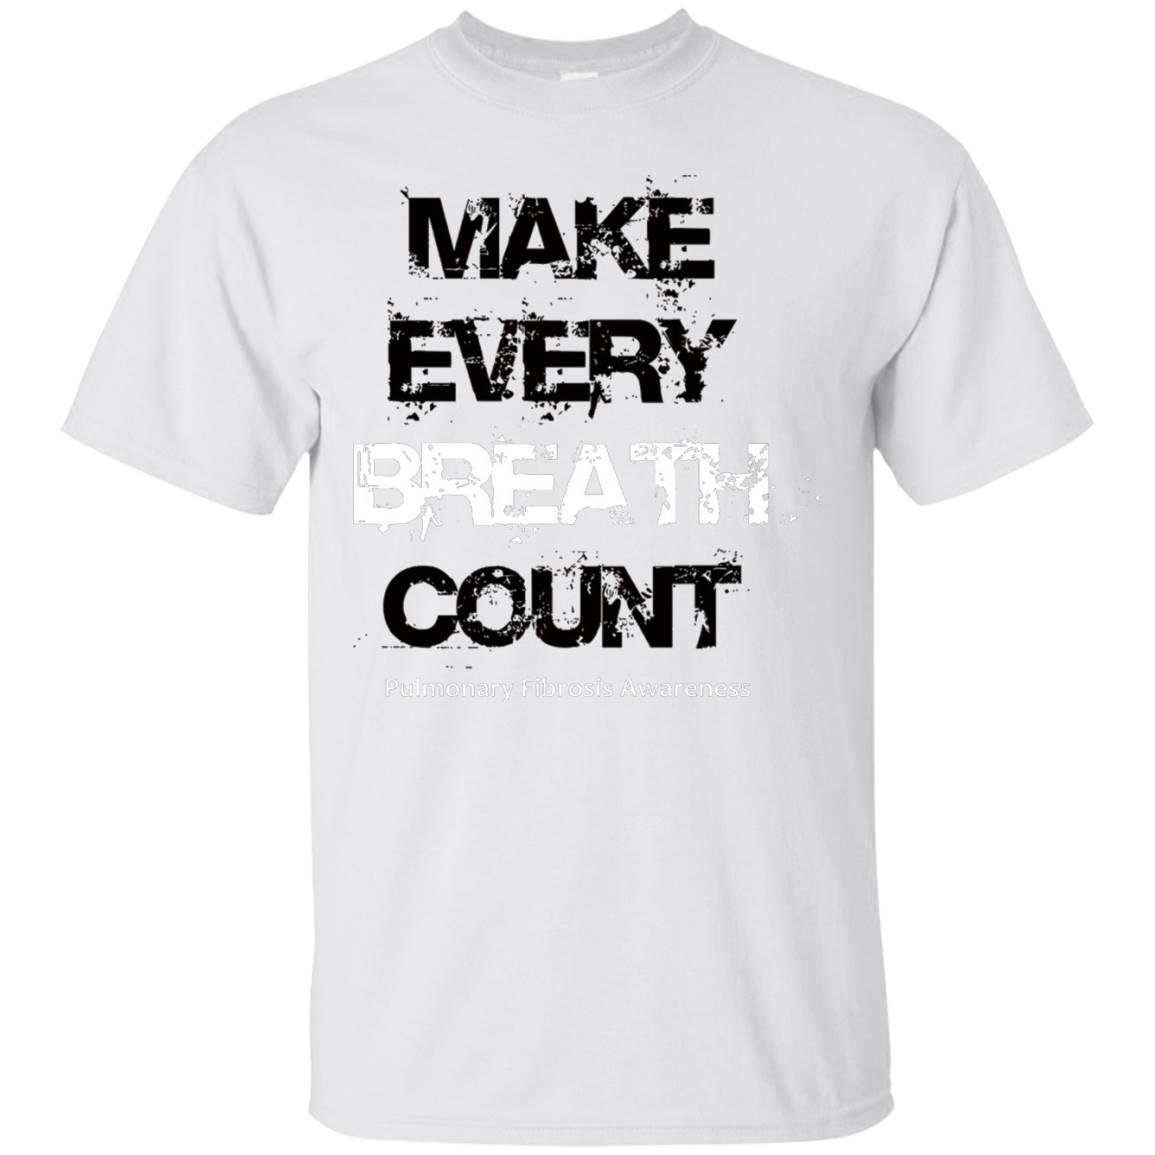 Make Every Breath Count Pulmonary Fibrosis Foundation Shirt